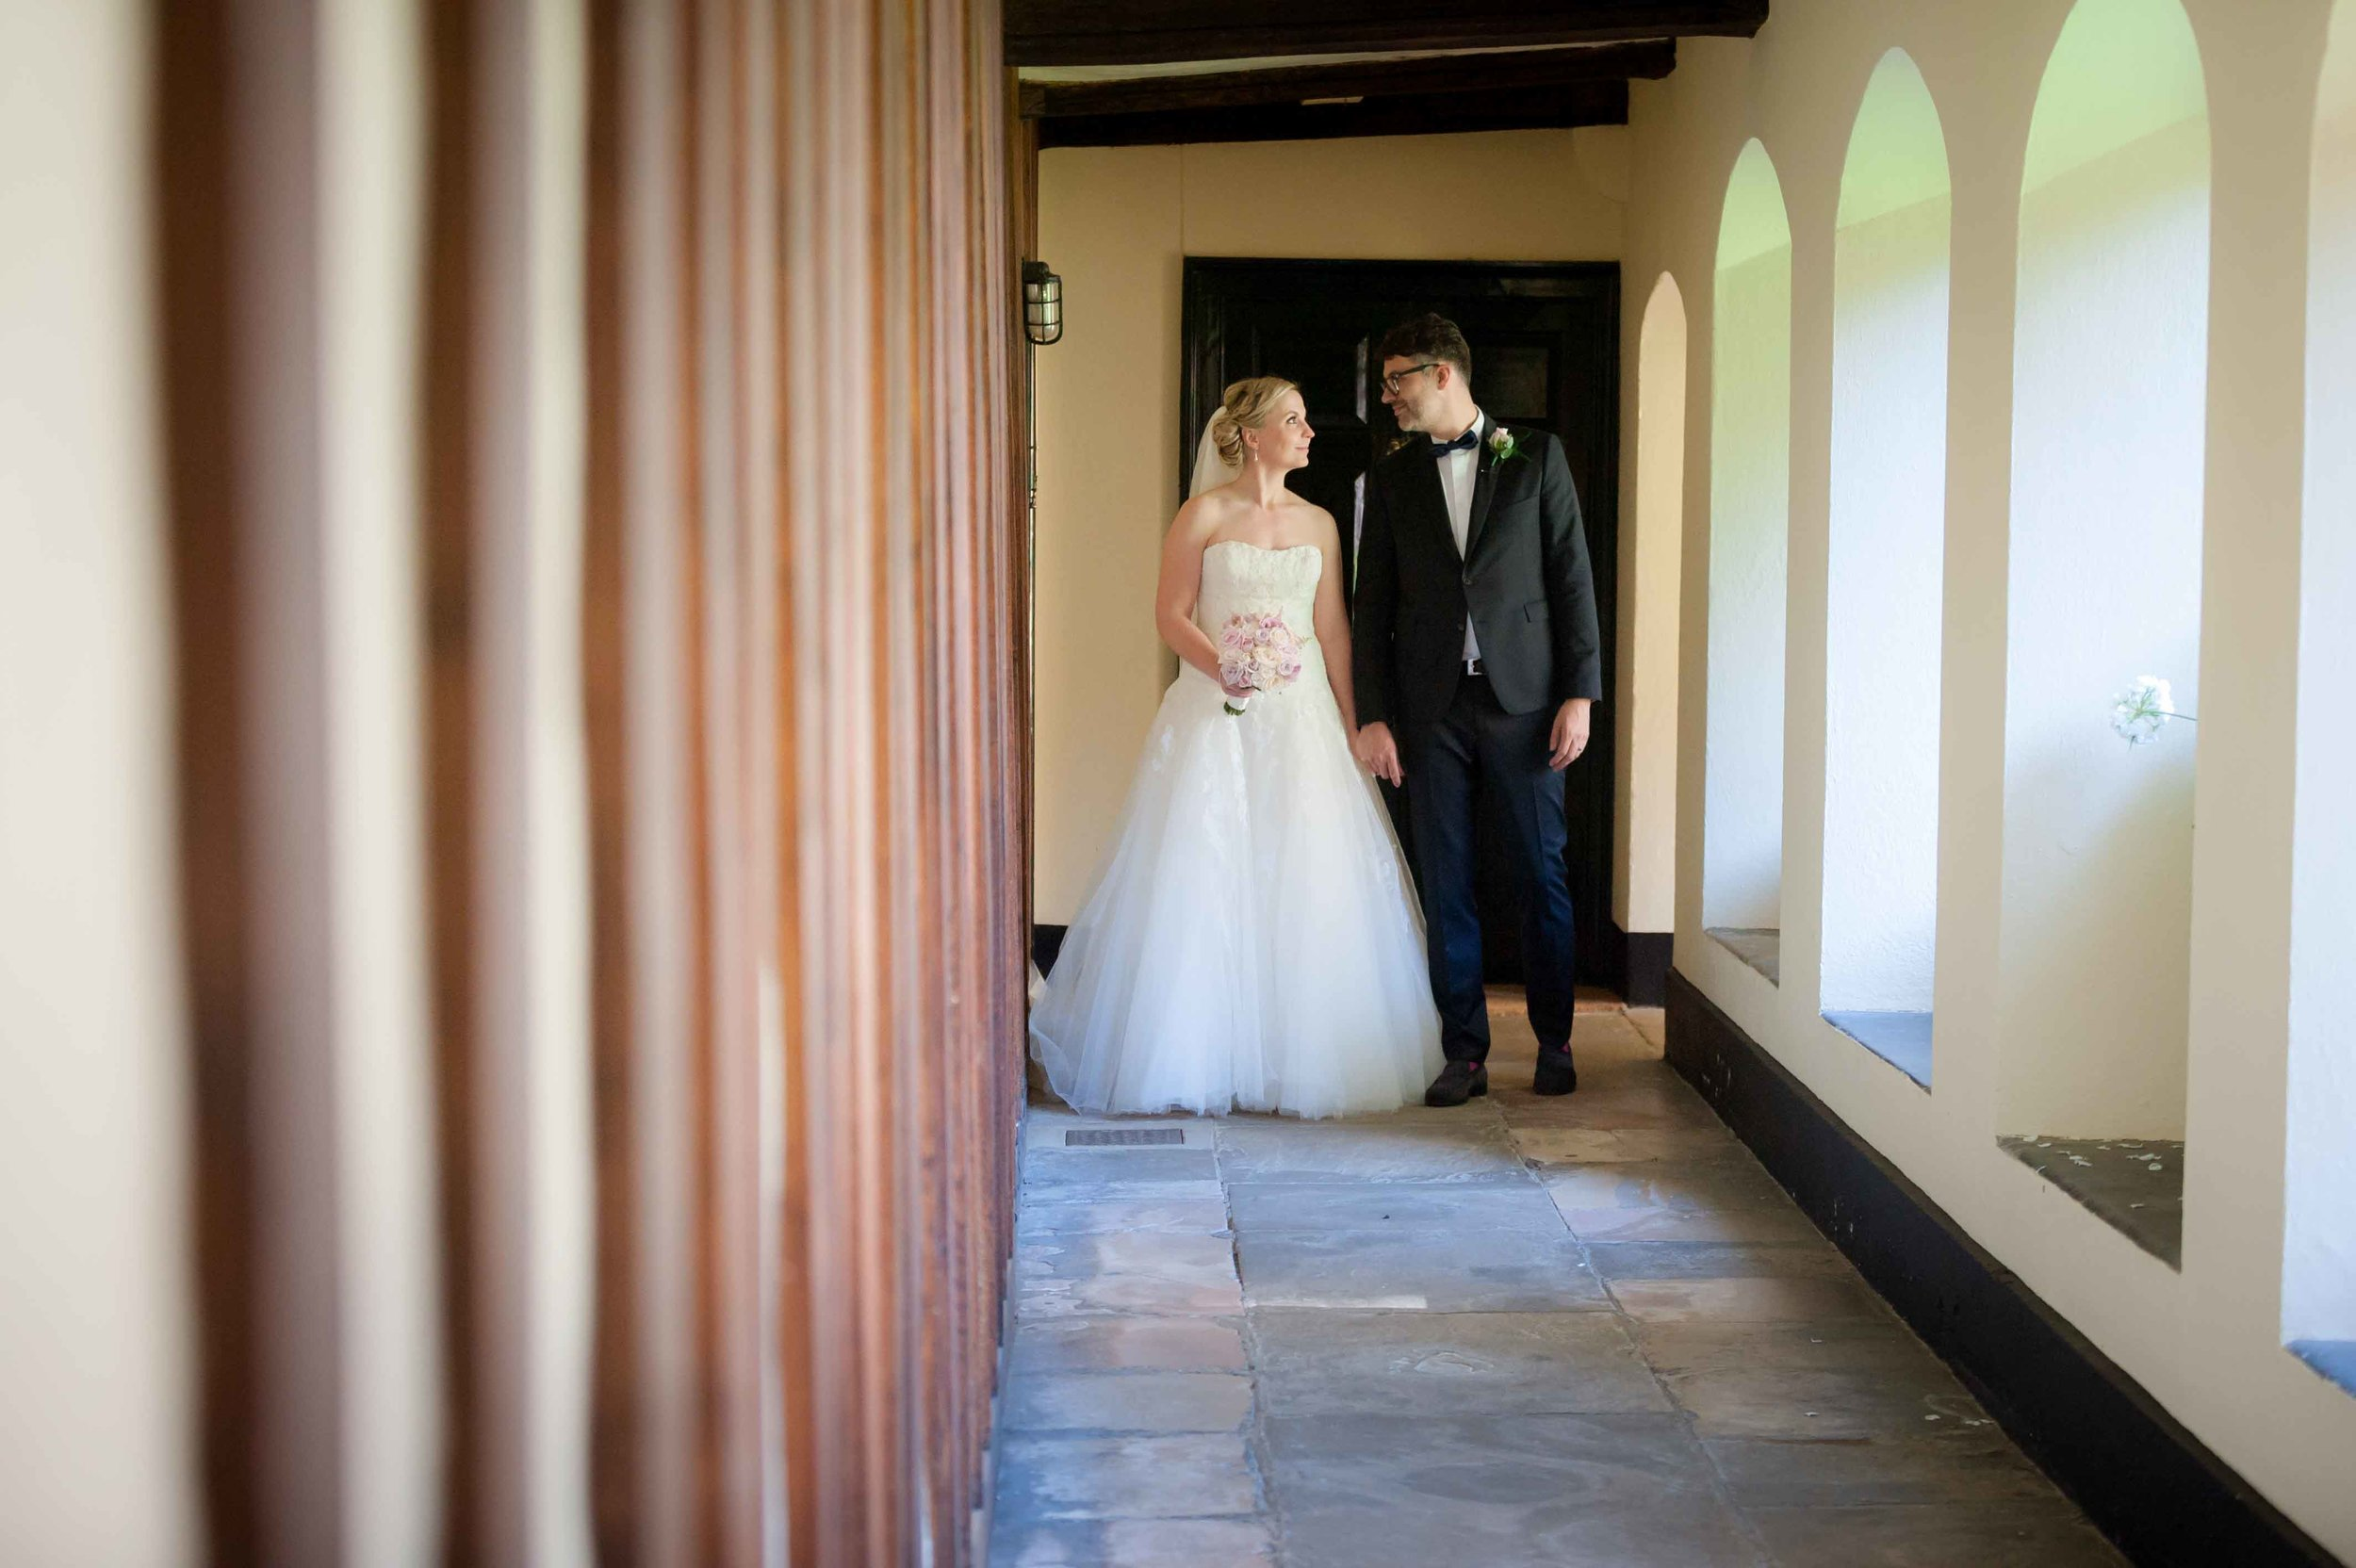 Adrian_Nicole_Charnwood_Weddings_Queens_College_Cambridge-1037.jpg